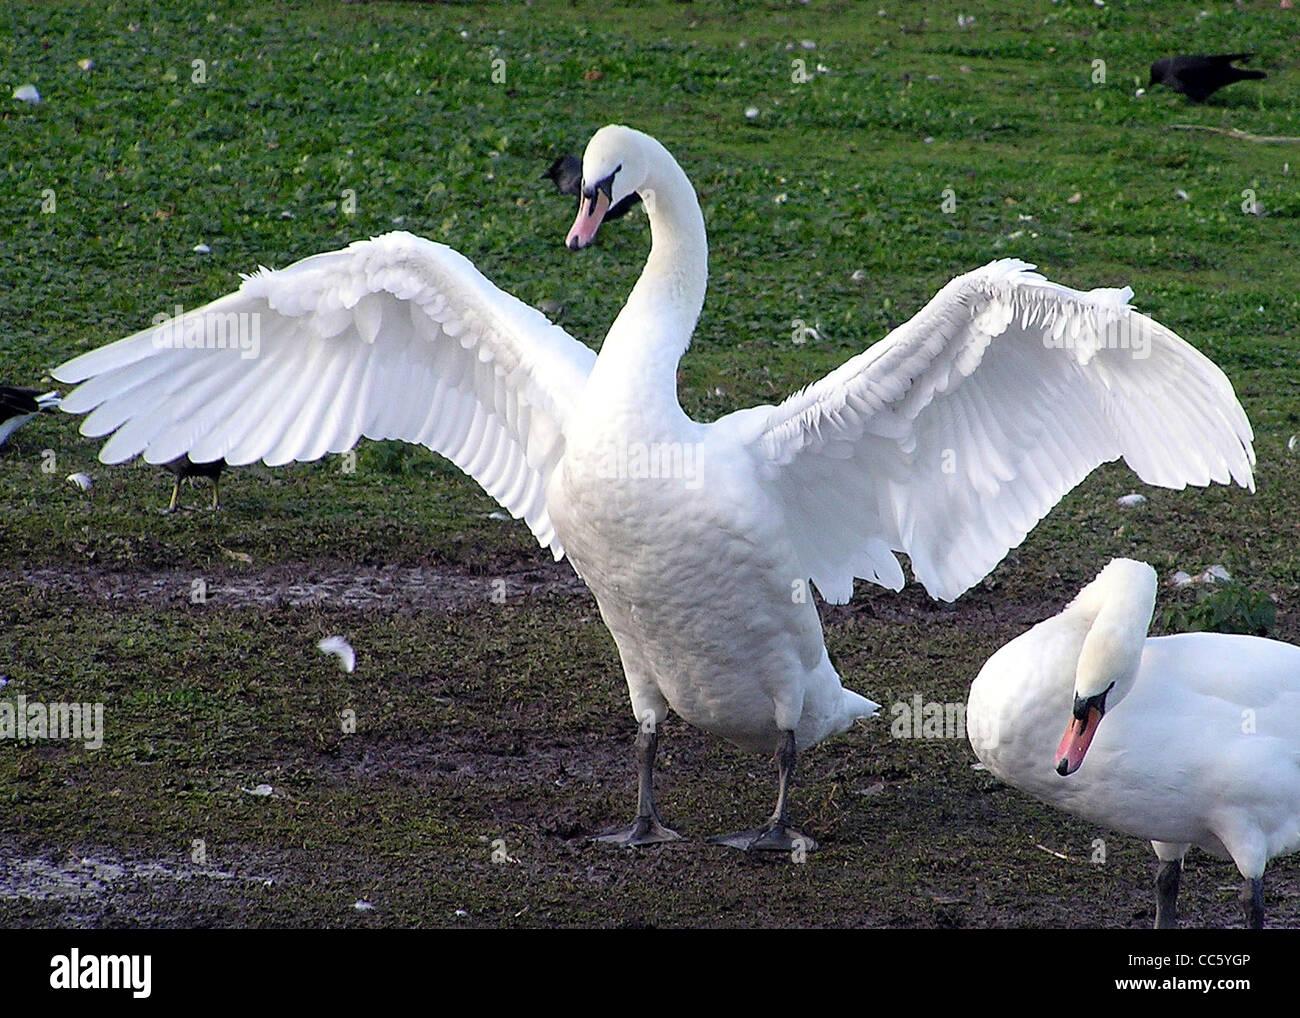 A swan spreads its wings at Slimbridge Wildfowl & Wetlands Centre, Slimbridge, Gloucestershire, England. - Stock Image